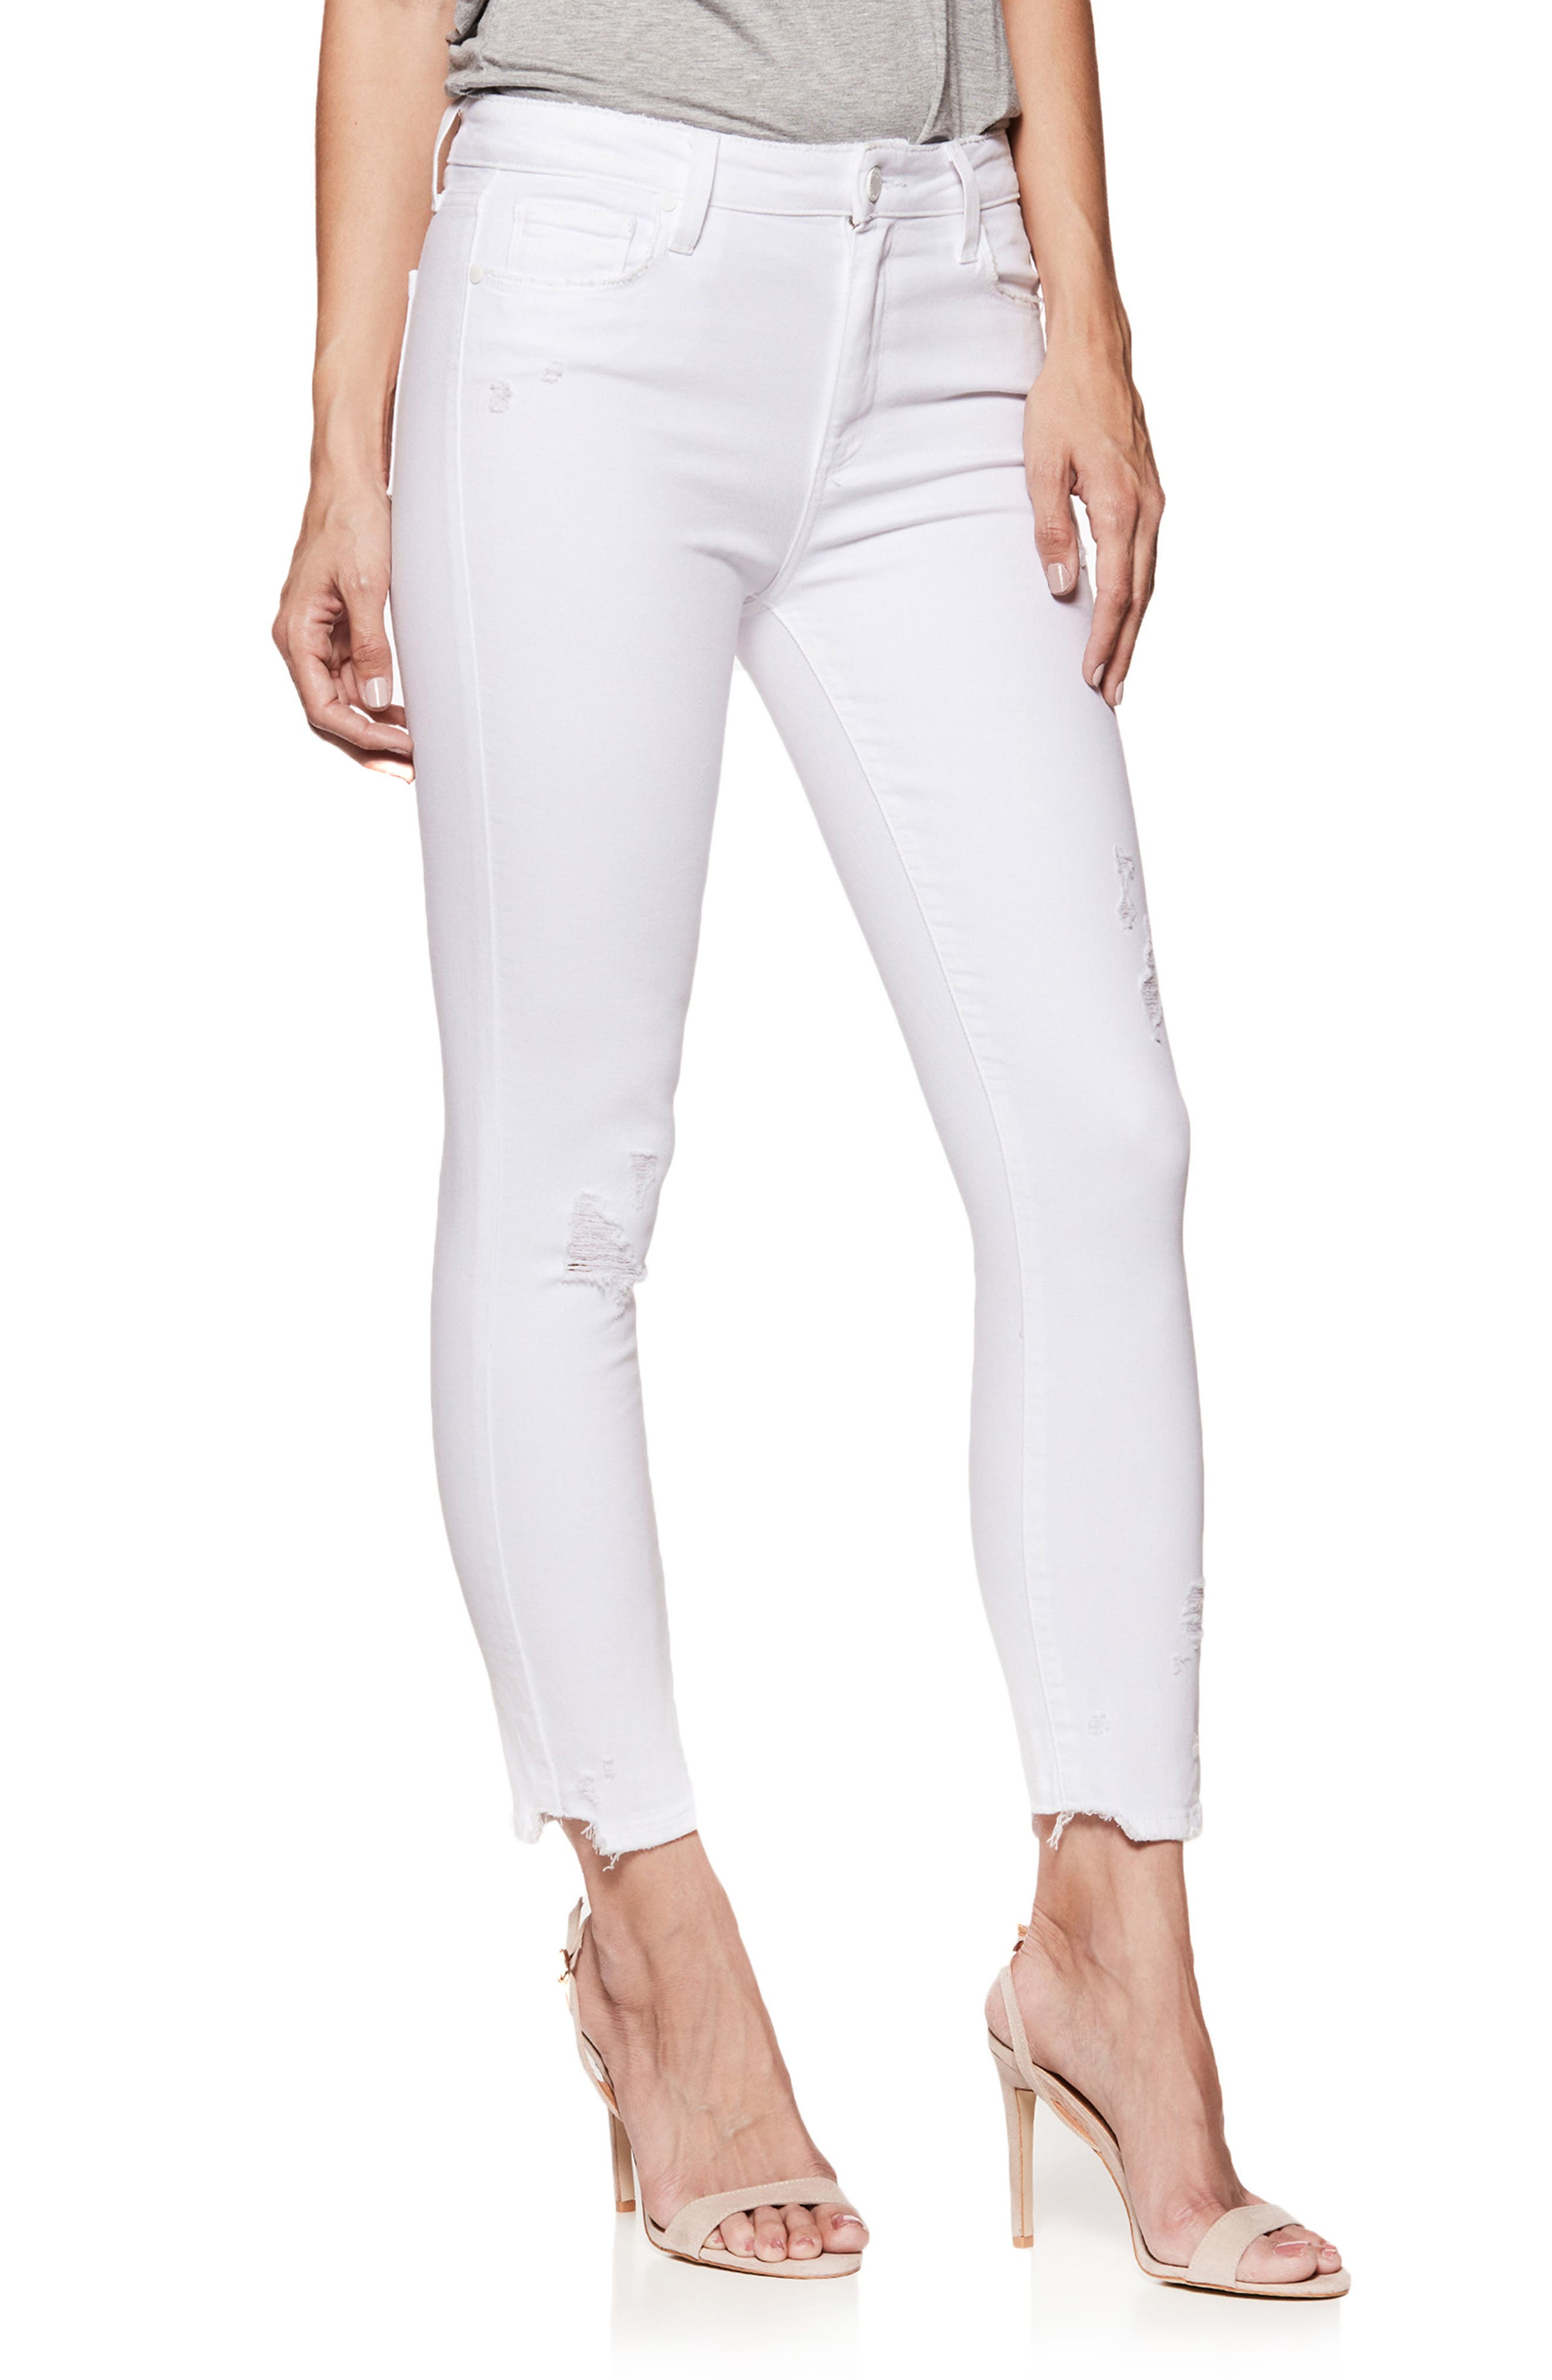 Hoxton High Waist Ankle Skinny Jeans,                             Main thumbnail 1, color,                             Crisp White Destructed